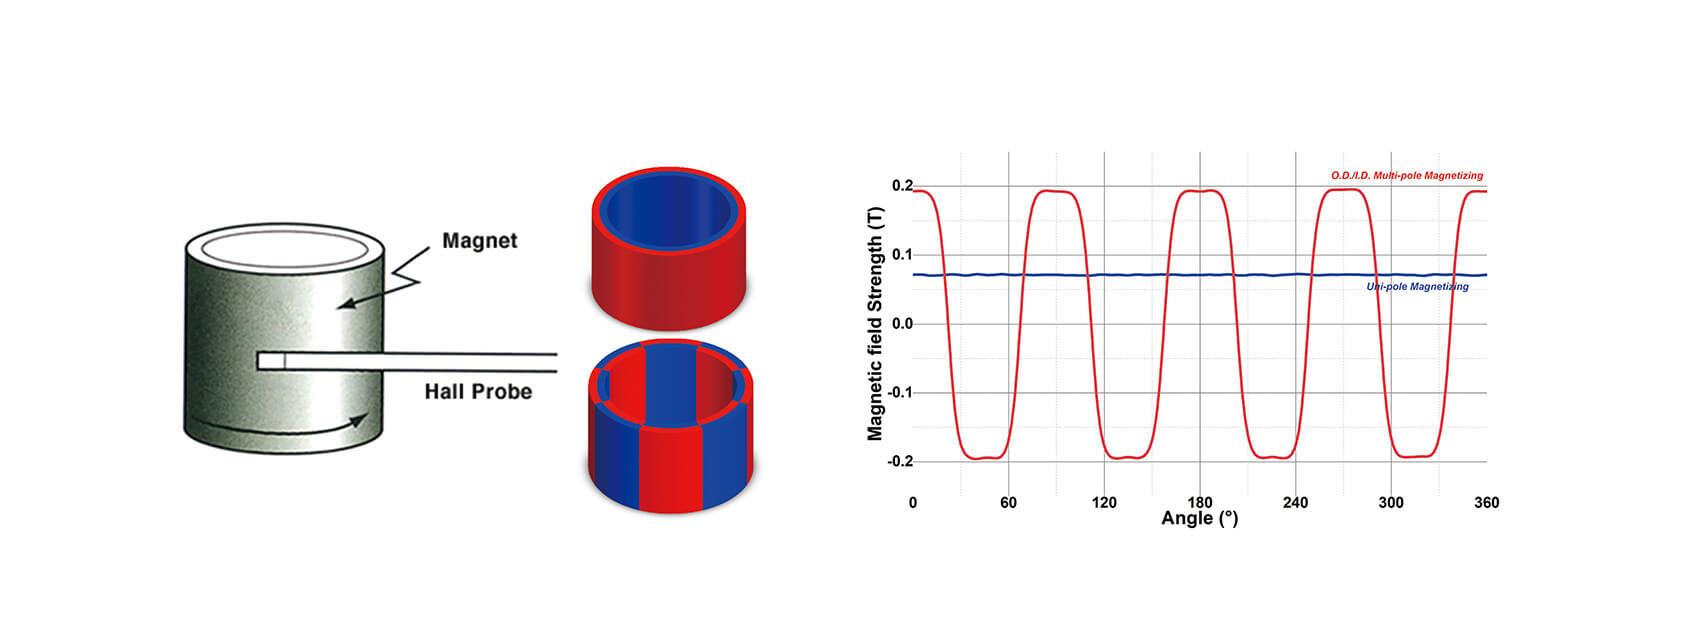 Imanes anulares orientados radialmente-2